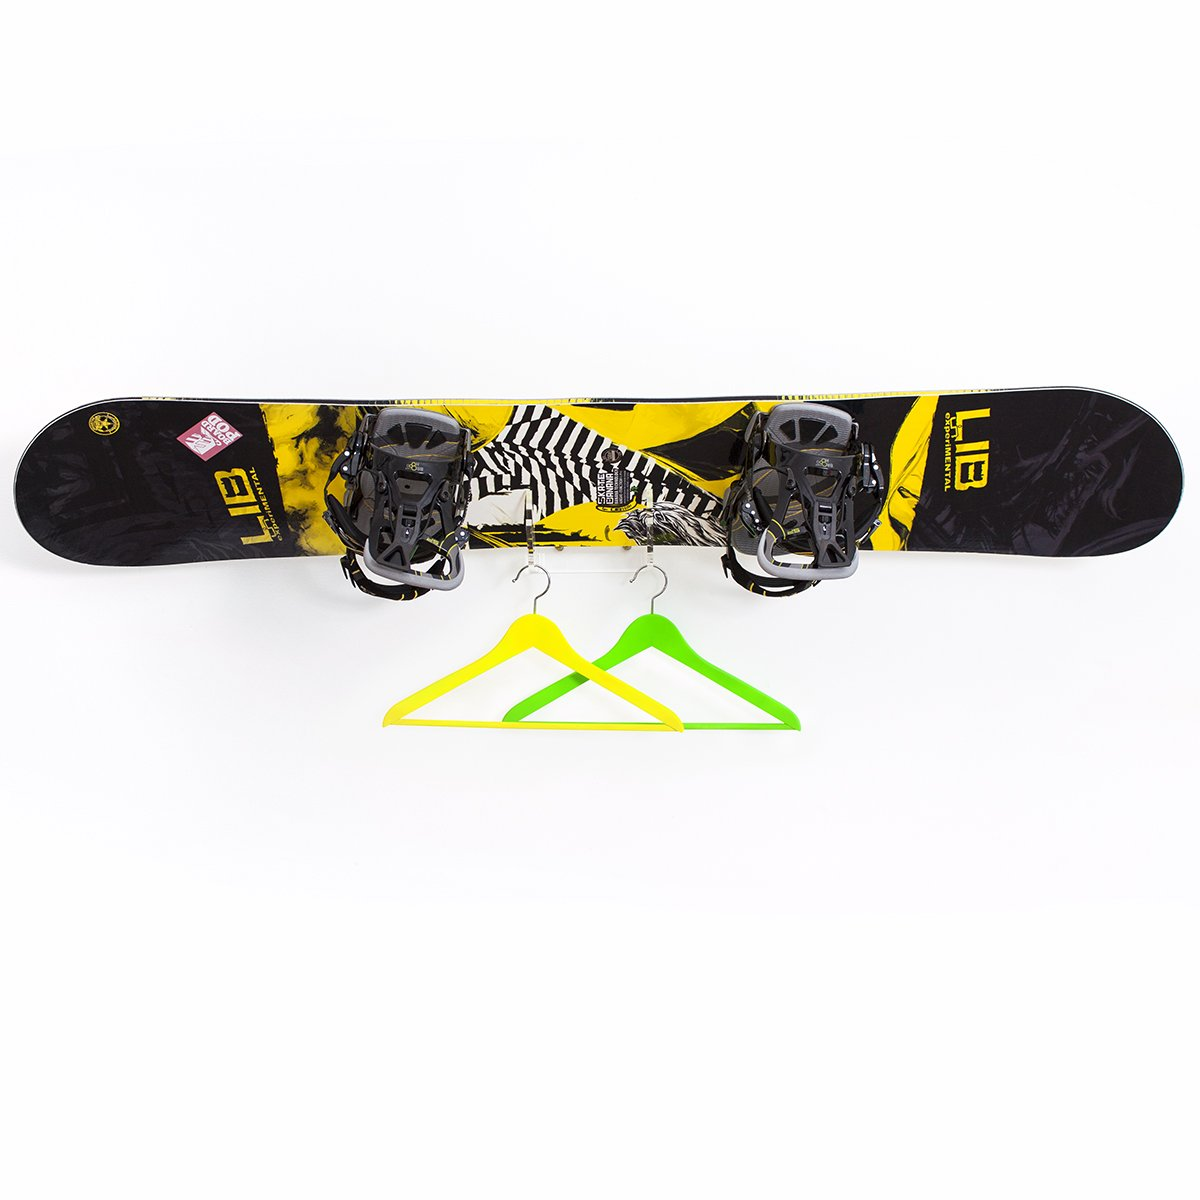 Skateboard Wandhalter f/ür 1 Wakeboard Kiteboard Longboard Wakeskate Skimboard WANDKINGS BOARDPOD One Board Rack Wandhalterung Snowboard